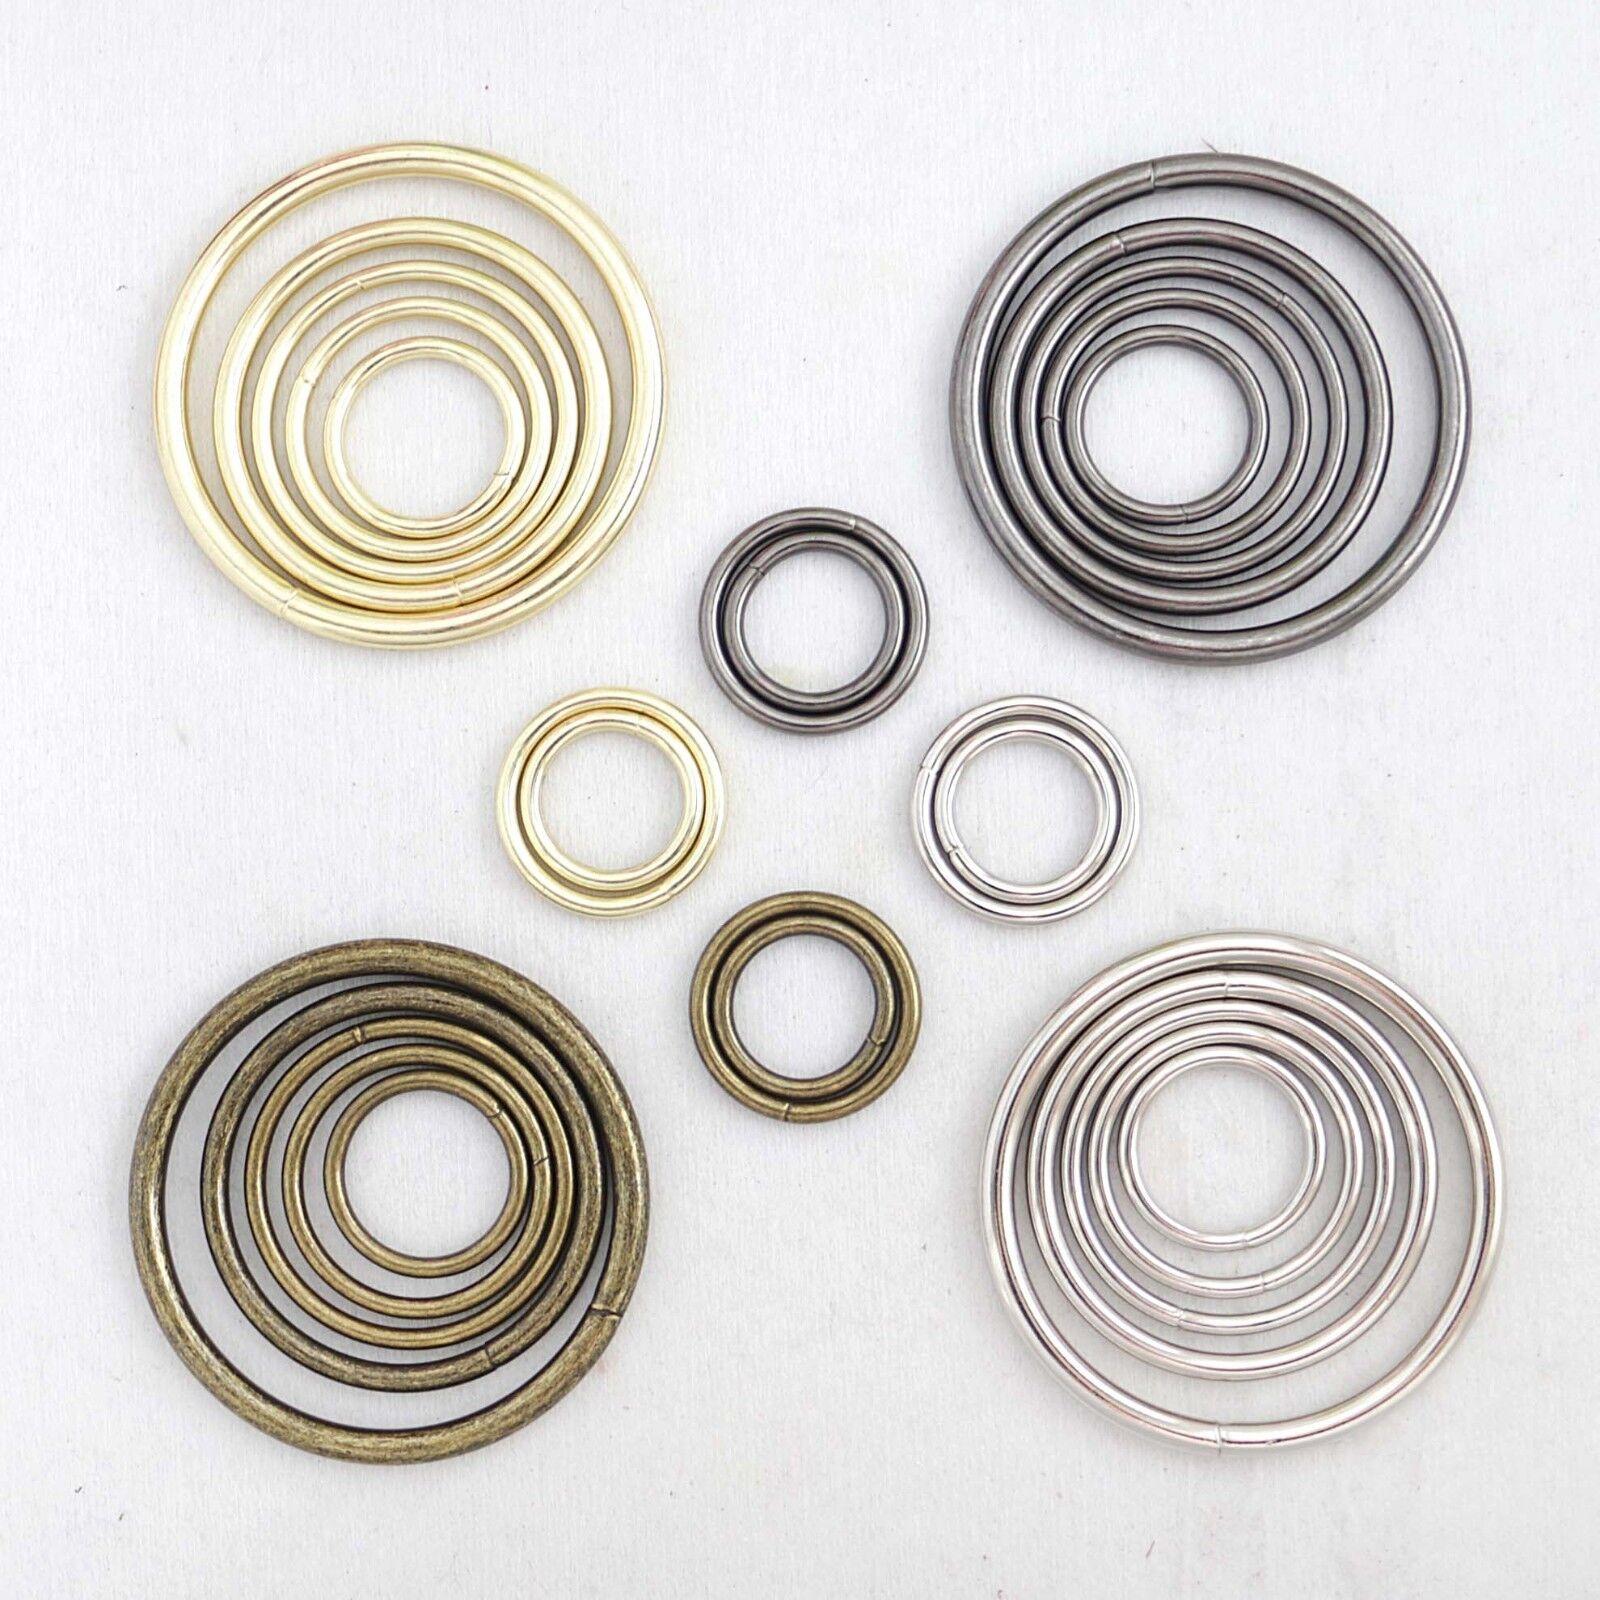 EU origin material O-ring ID x cross,mm 25 x 3,55 DIN 3770 variable pack